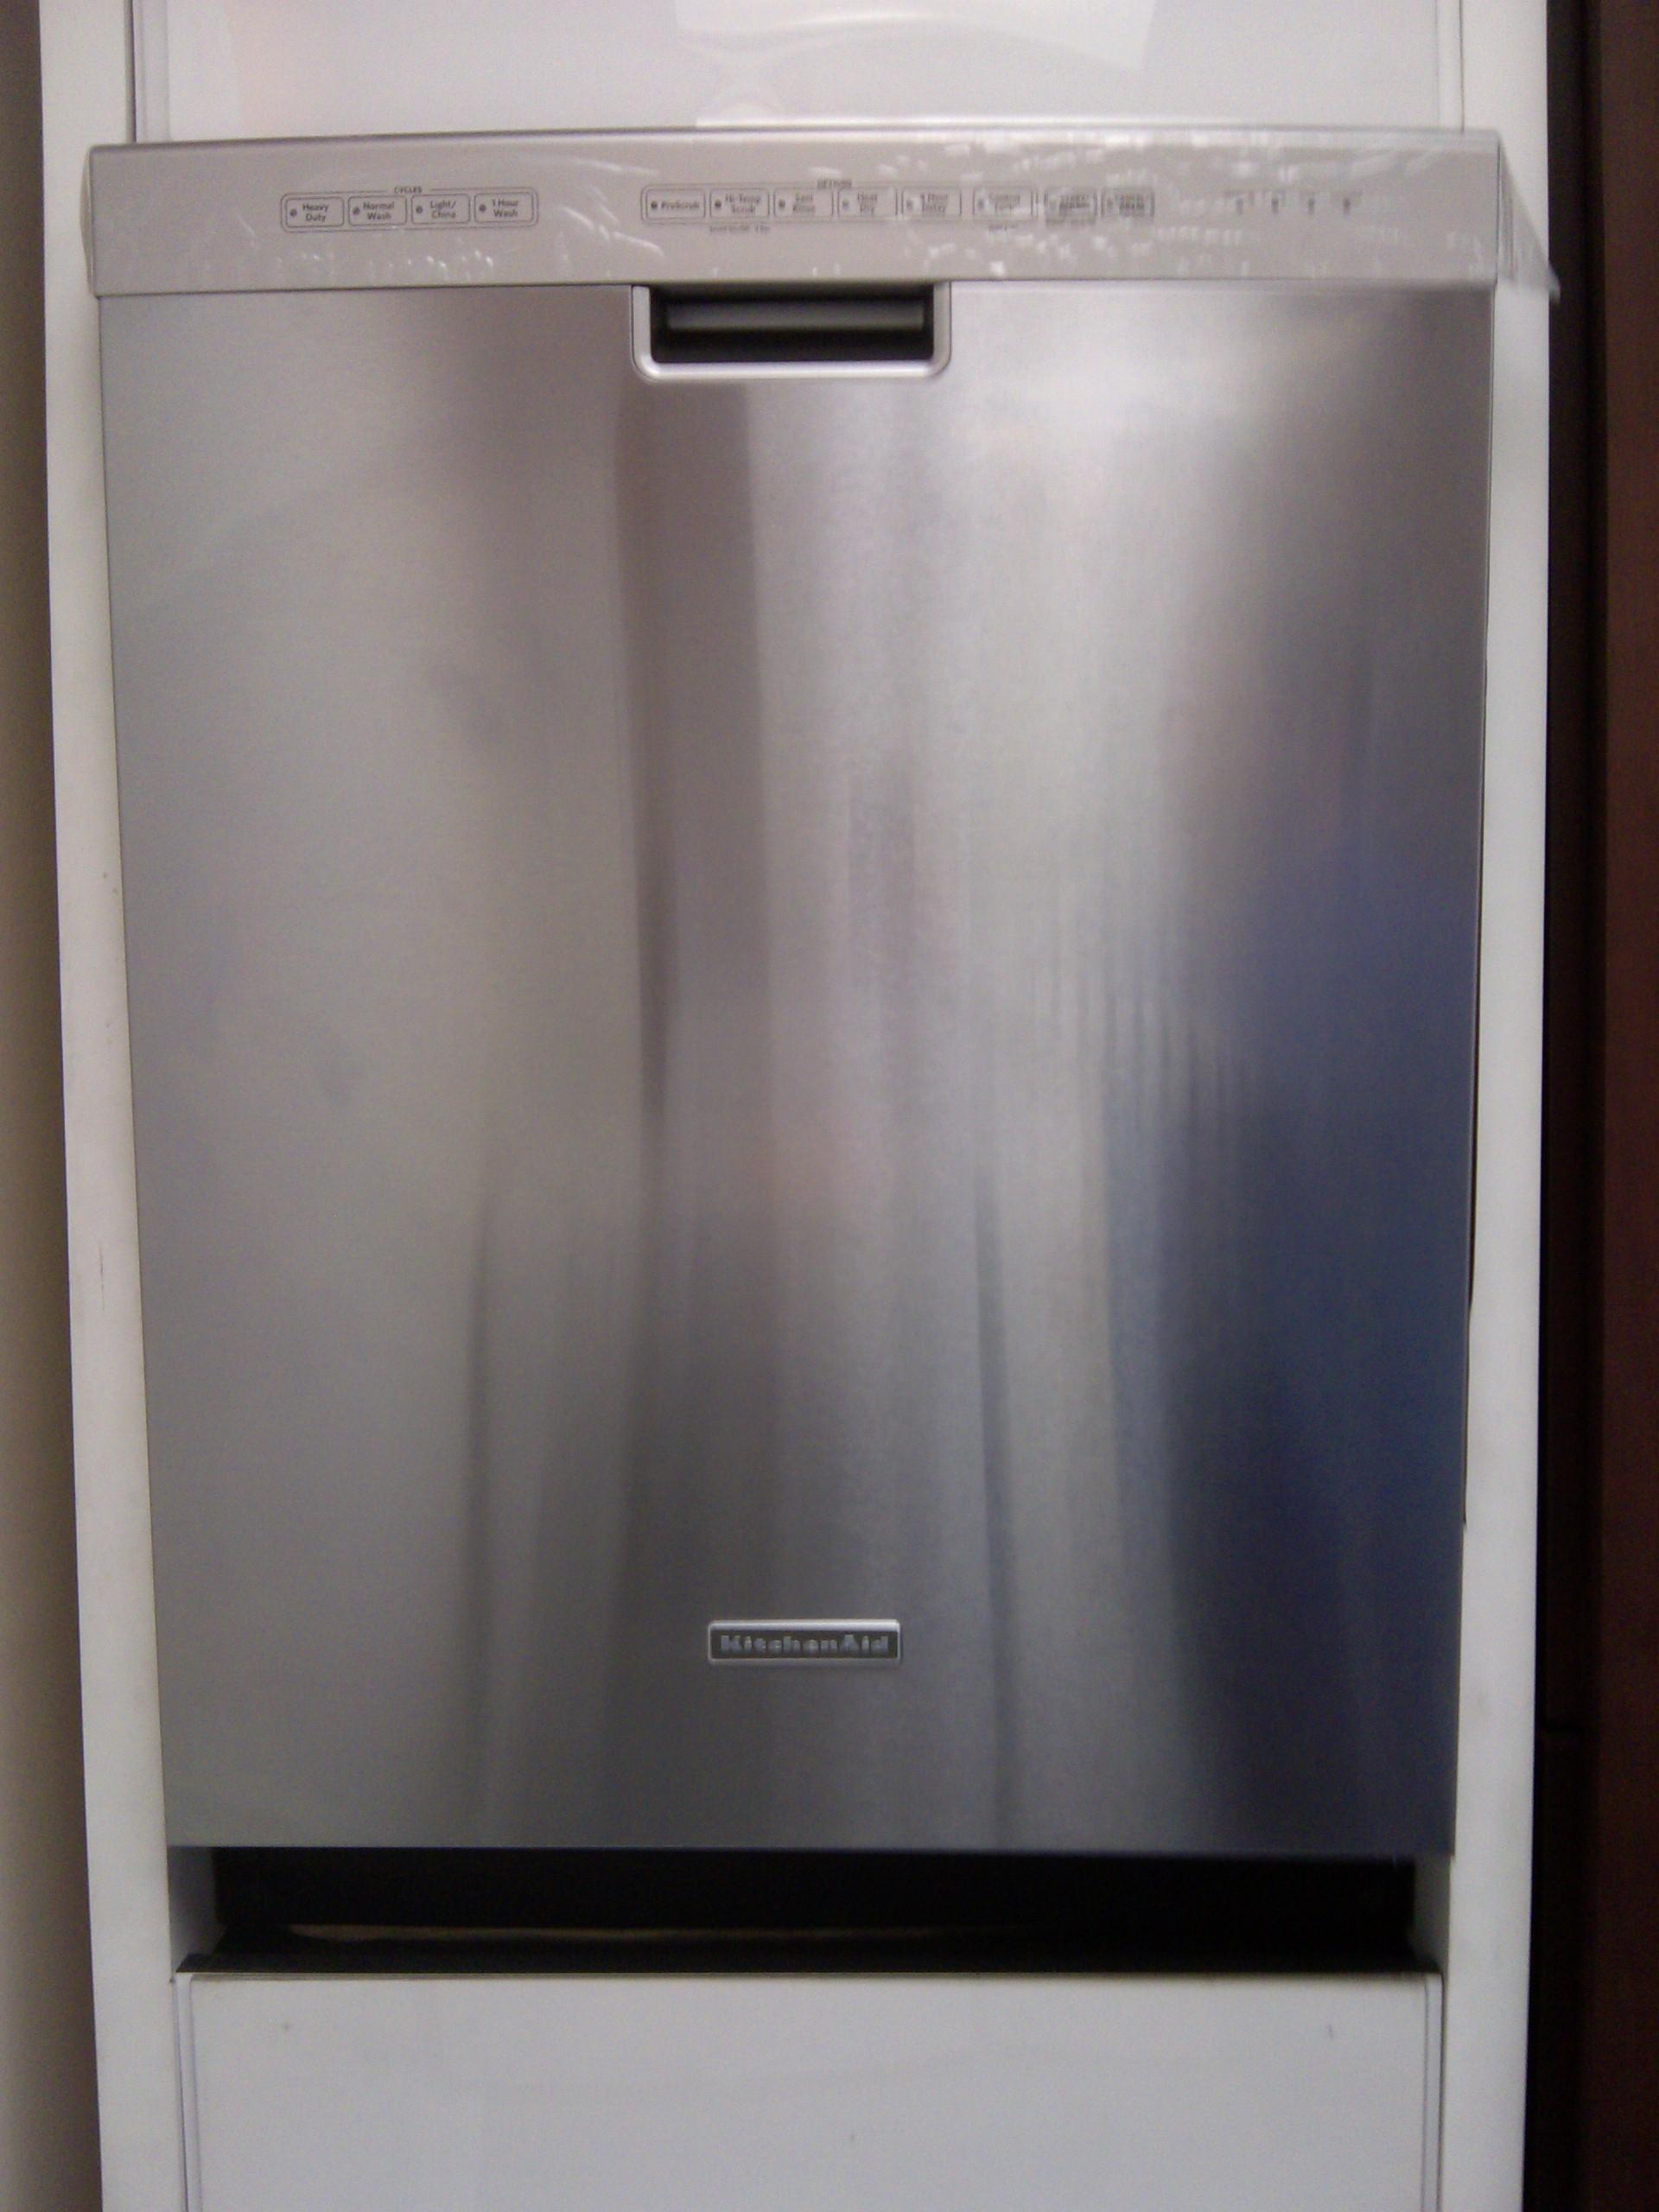 kitchen aid washer mobile food for sale 9 kitchenaid kuds30ixss 24 built in dishwasher